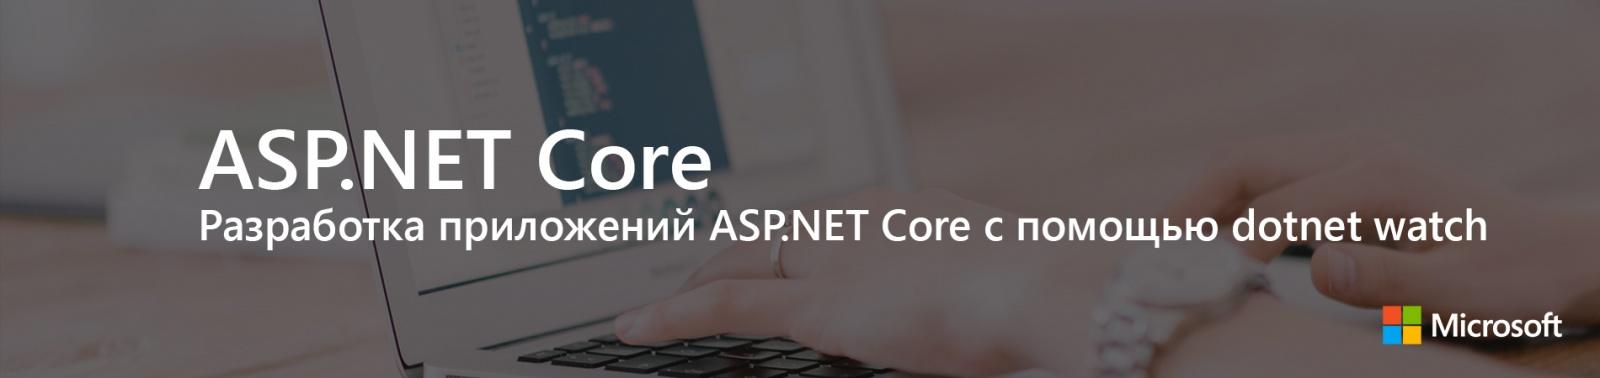 ASP.NET Core: Разработка приложений ASP.NET Core с помощью dotnet watch - 1